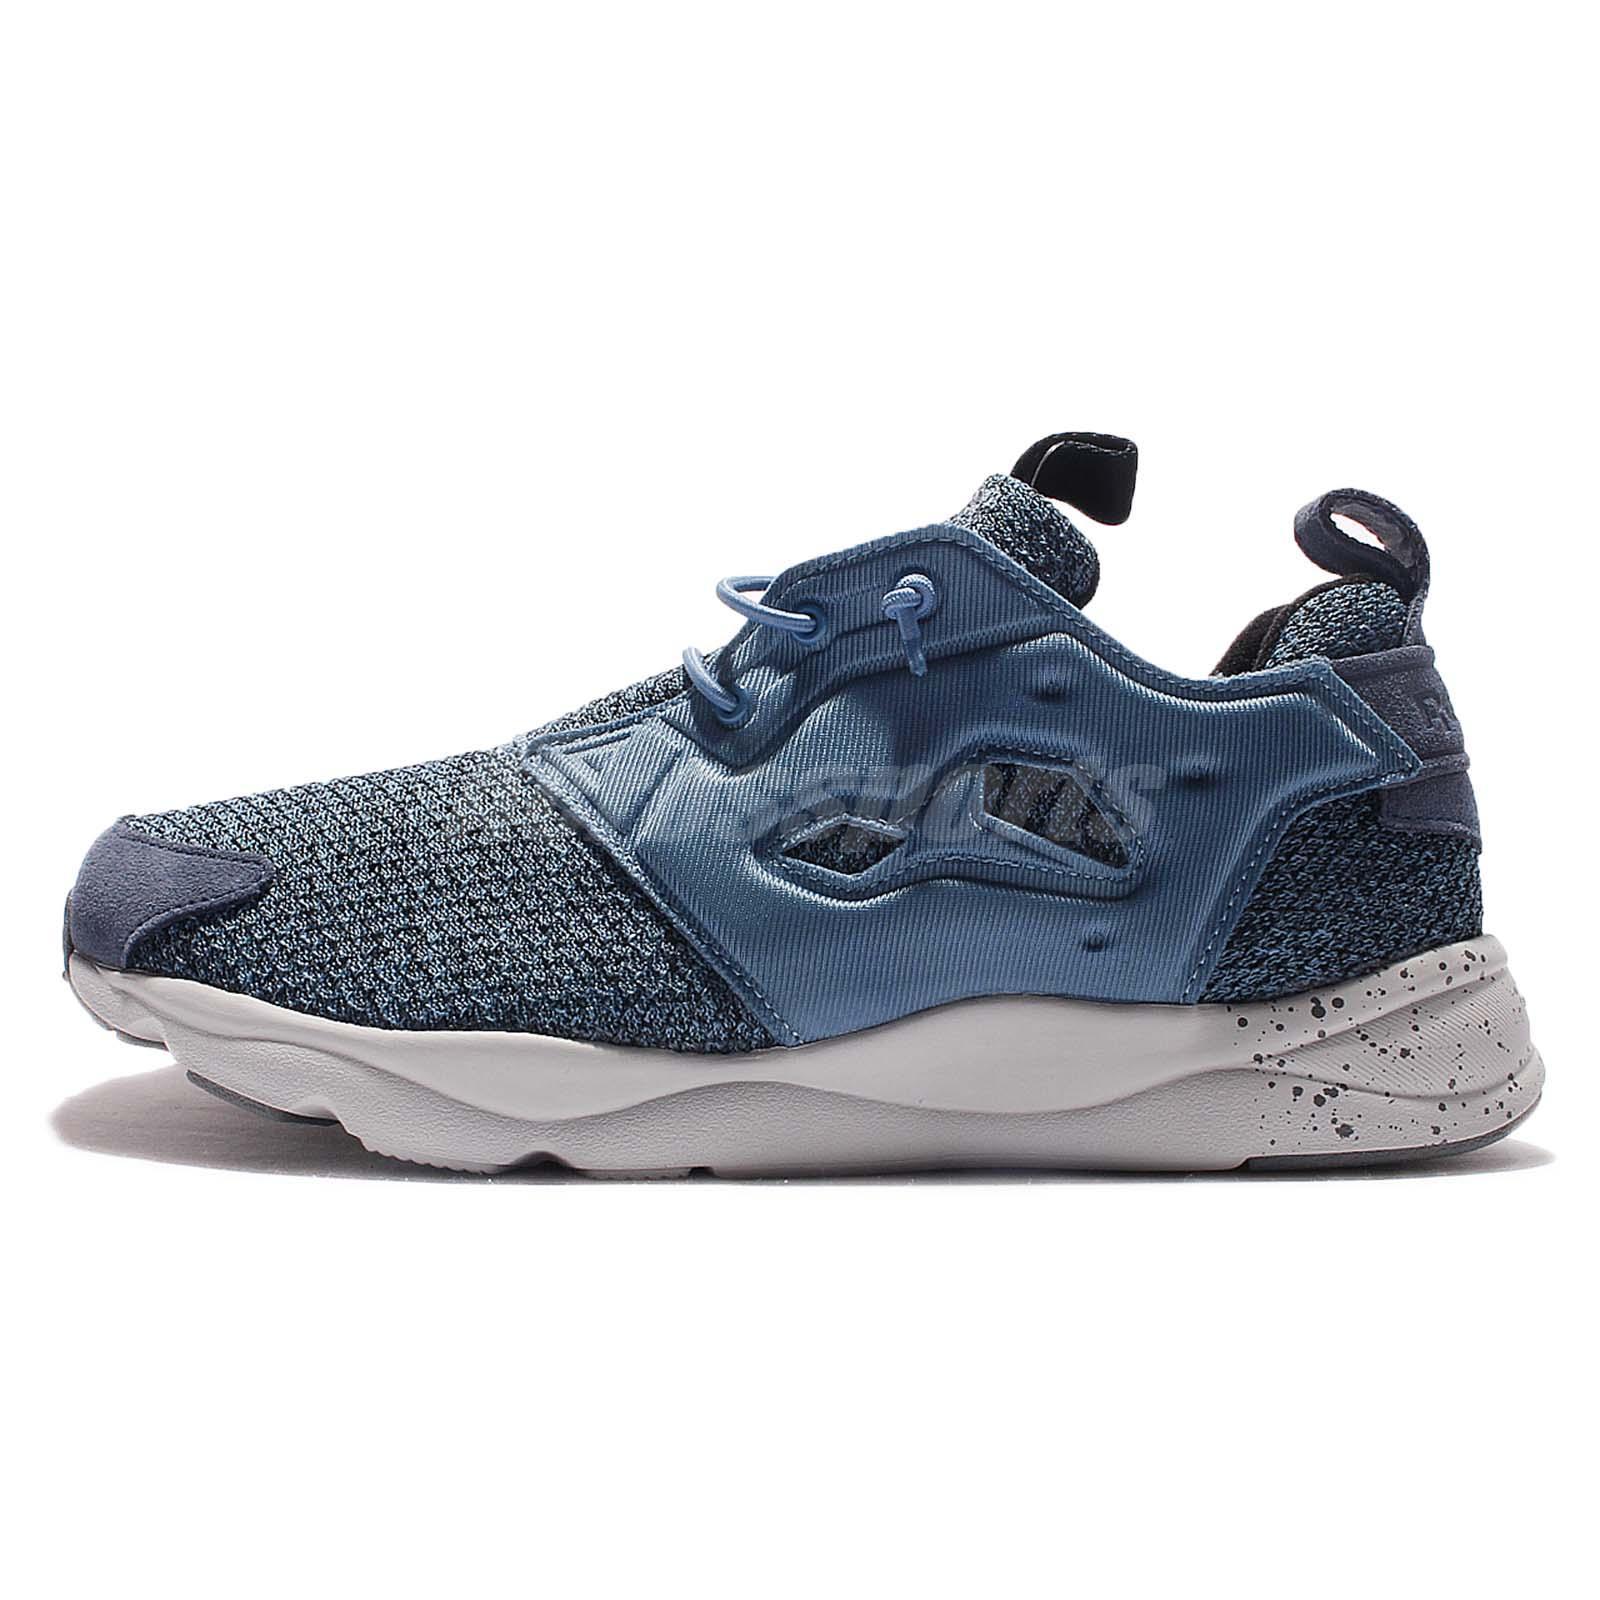 Reebok Furylite GW Blue Grey Men Casual Shoes Speckle Sneakers Trainers  AQ9674